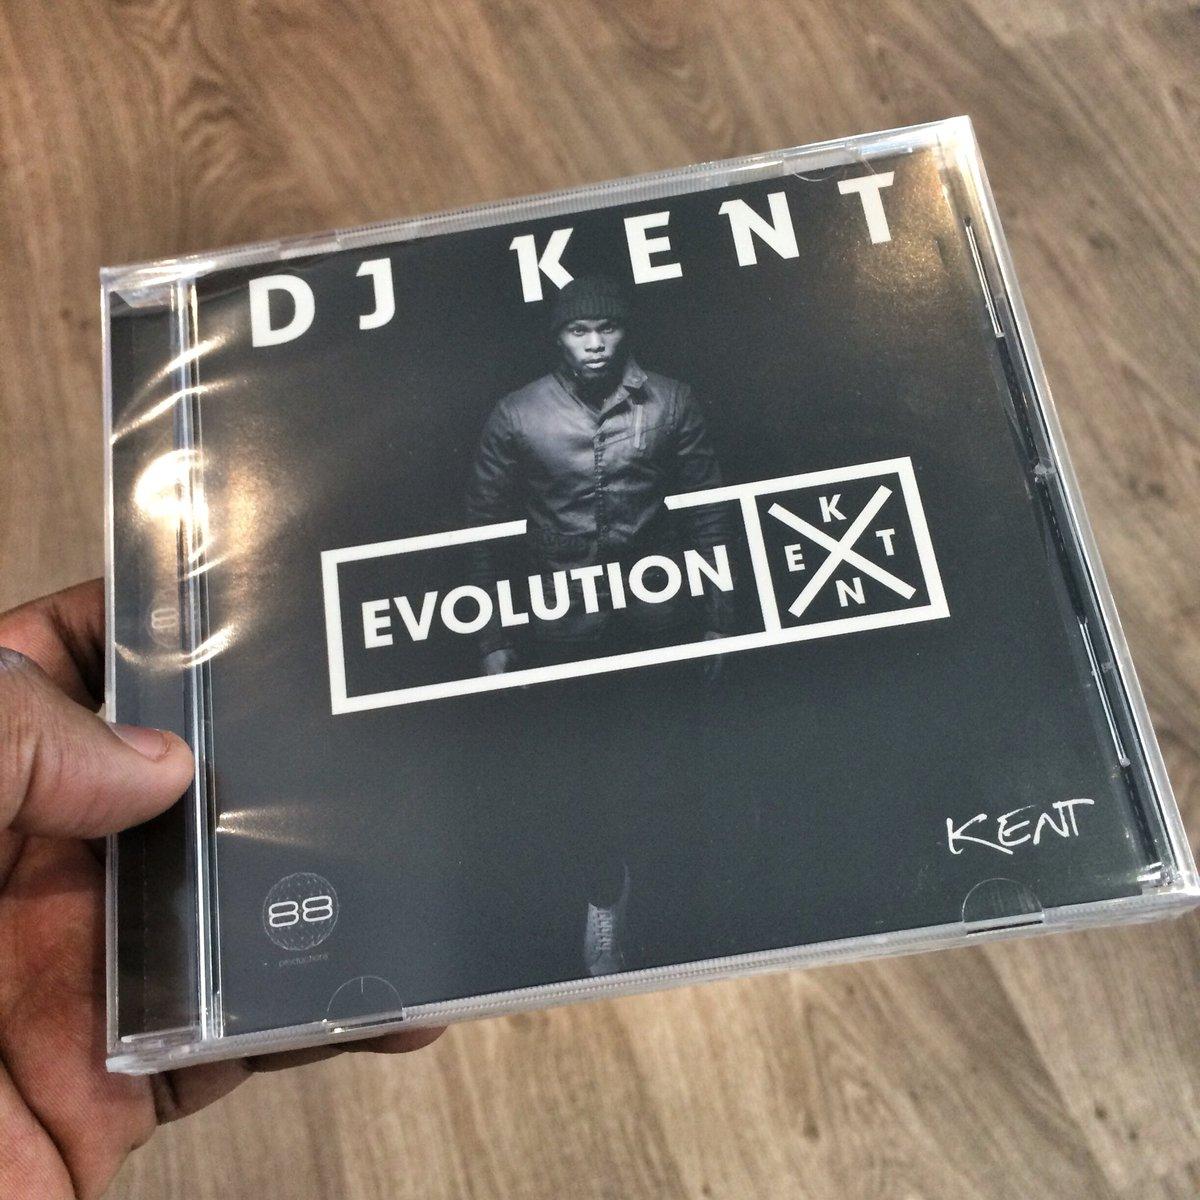 EVOLUTION X Out tomorrow!!! #EvolutionX https://t.co/WyTEBxiy9J